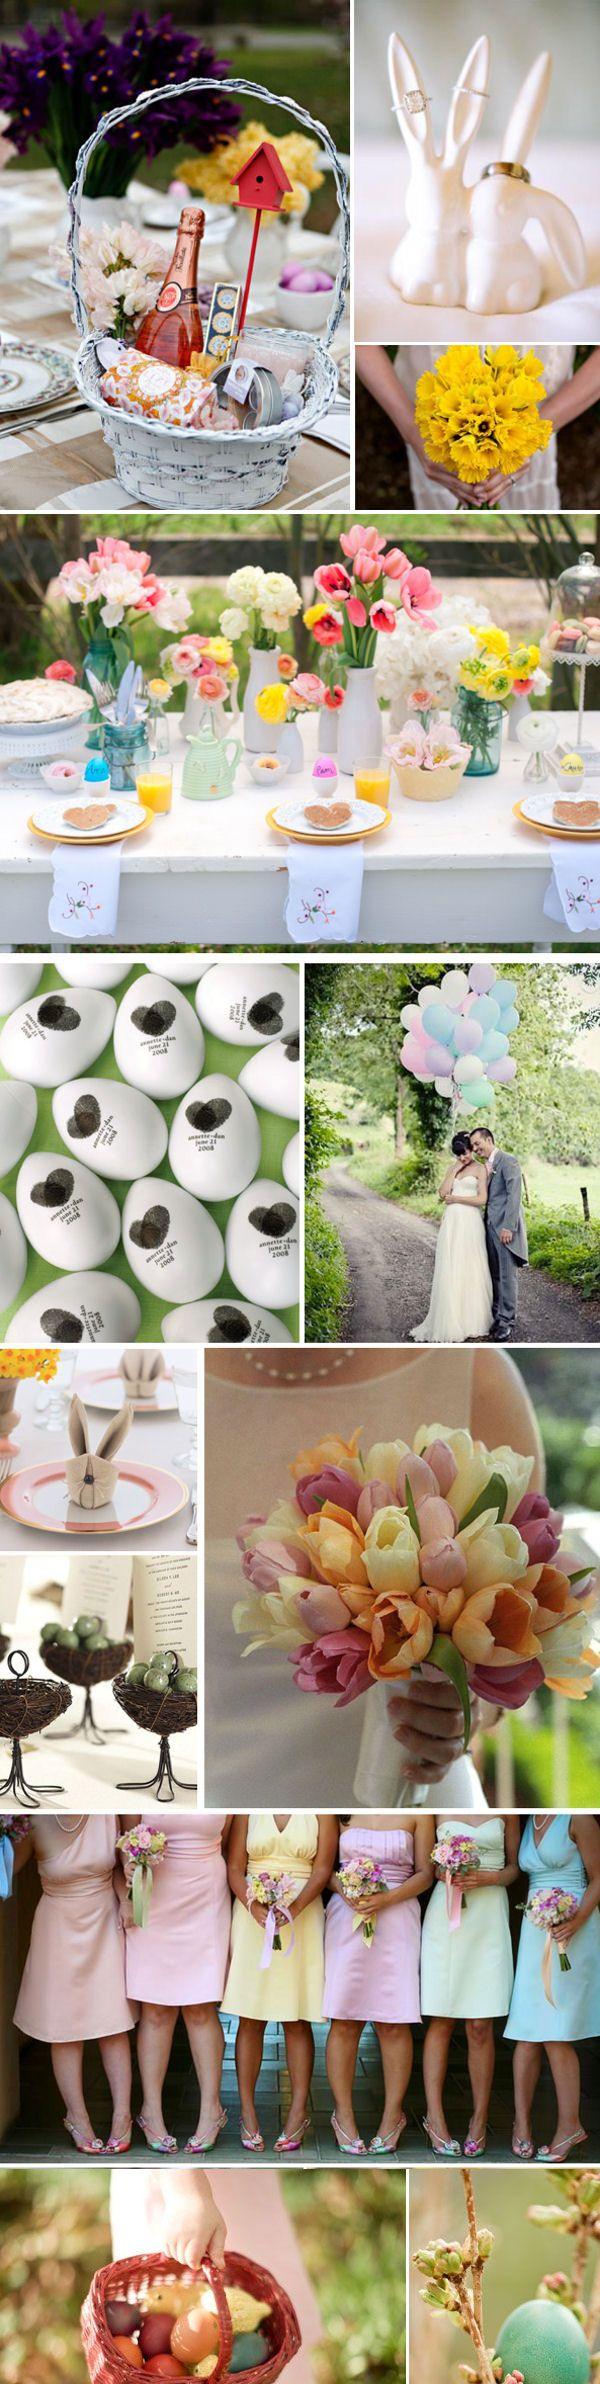 Easter Wedding Celebration Including Folded Bunny Napkins Painted Eggs Pastel Bridesmaids Dresses